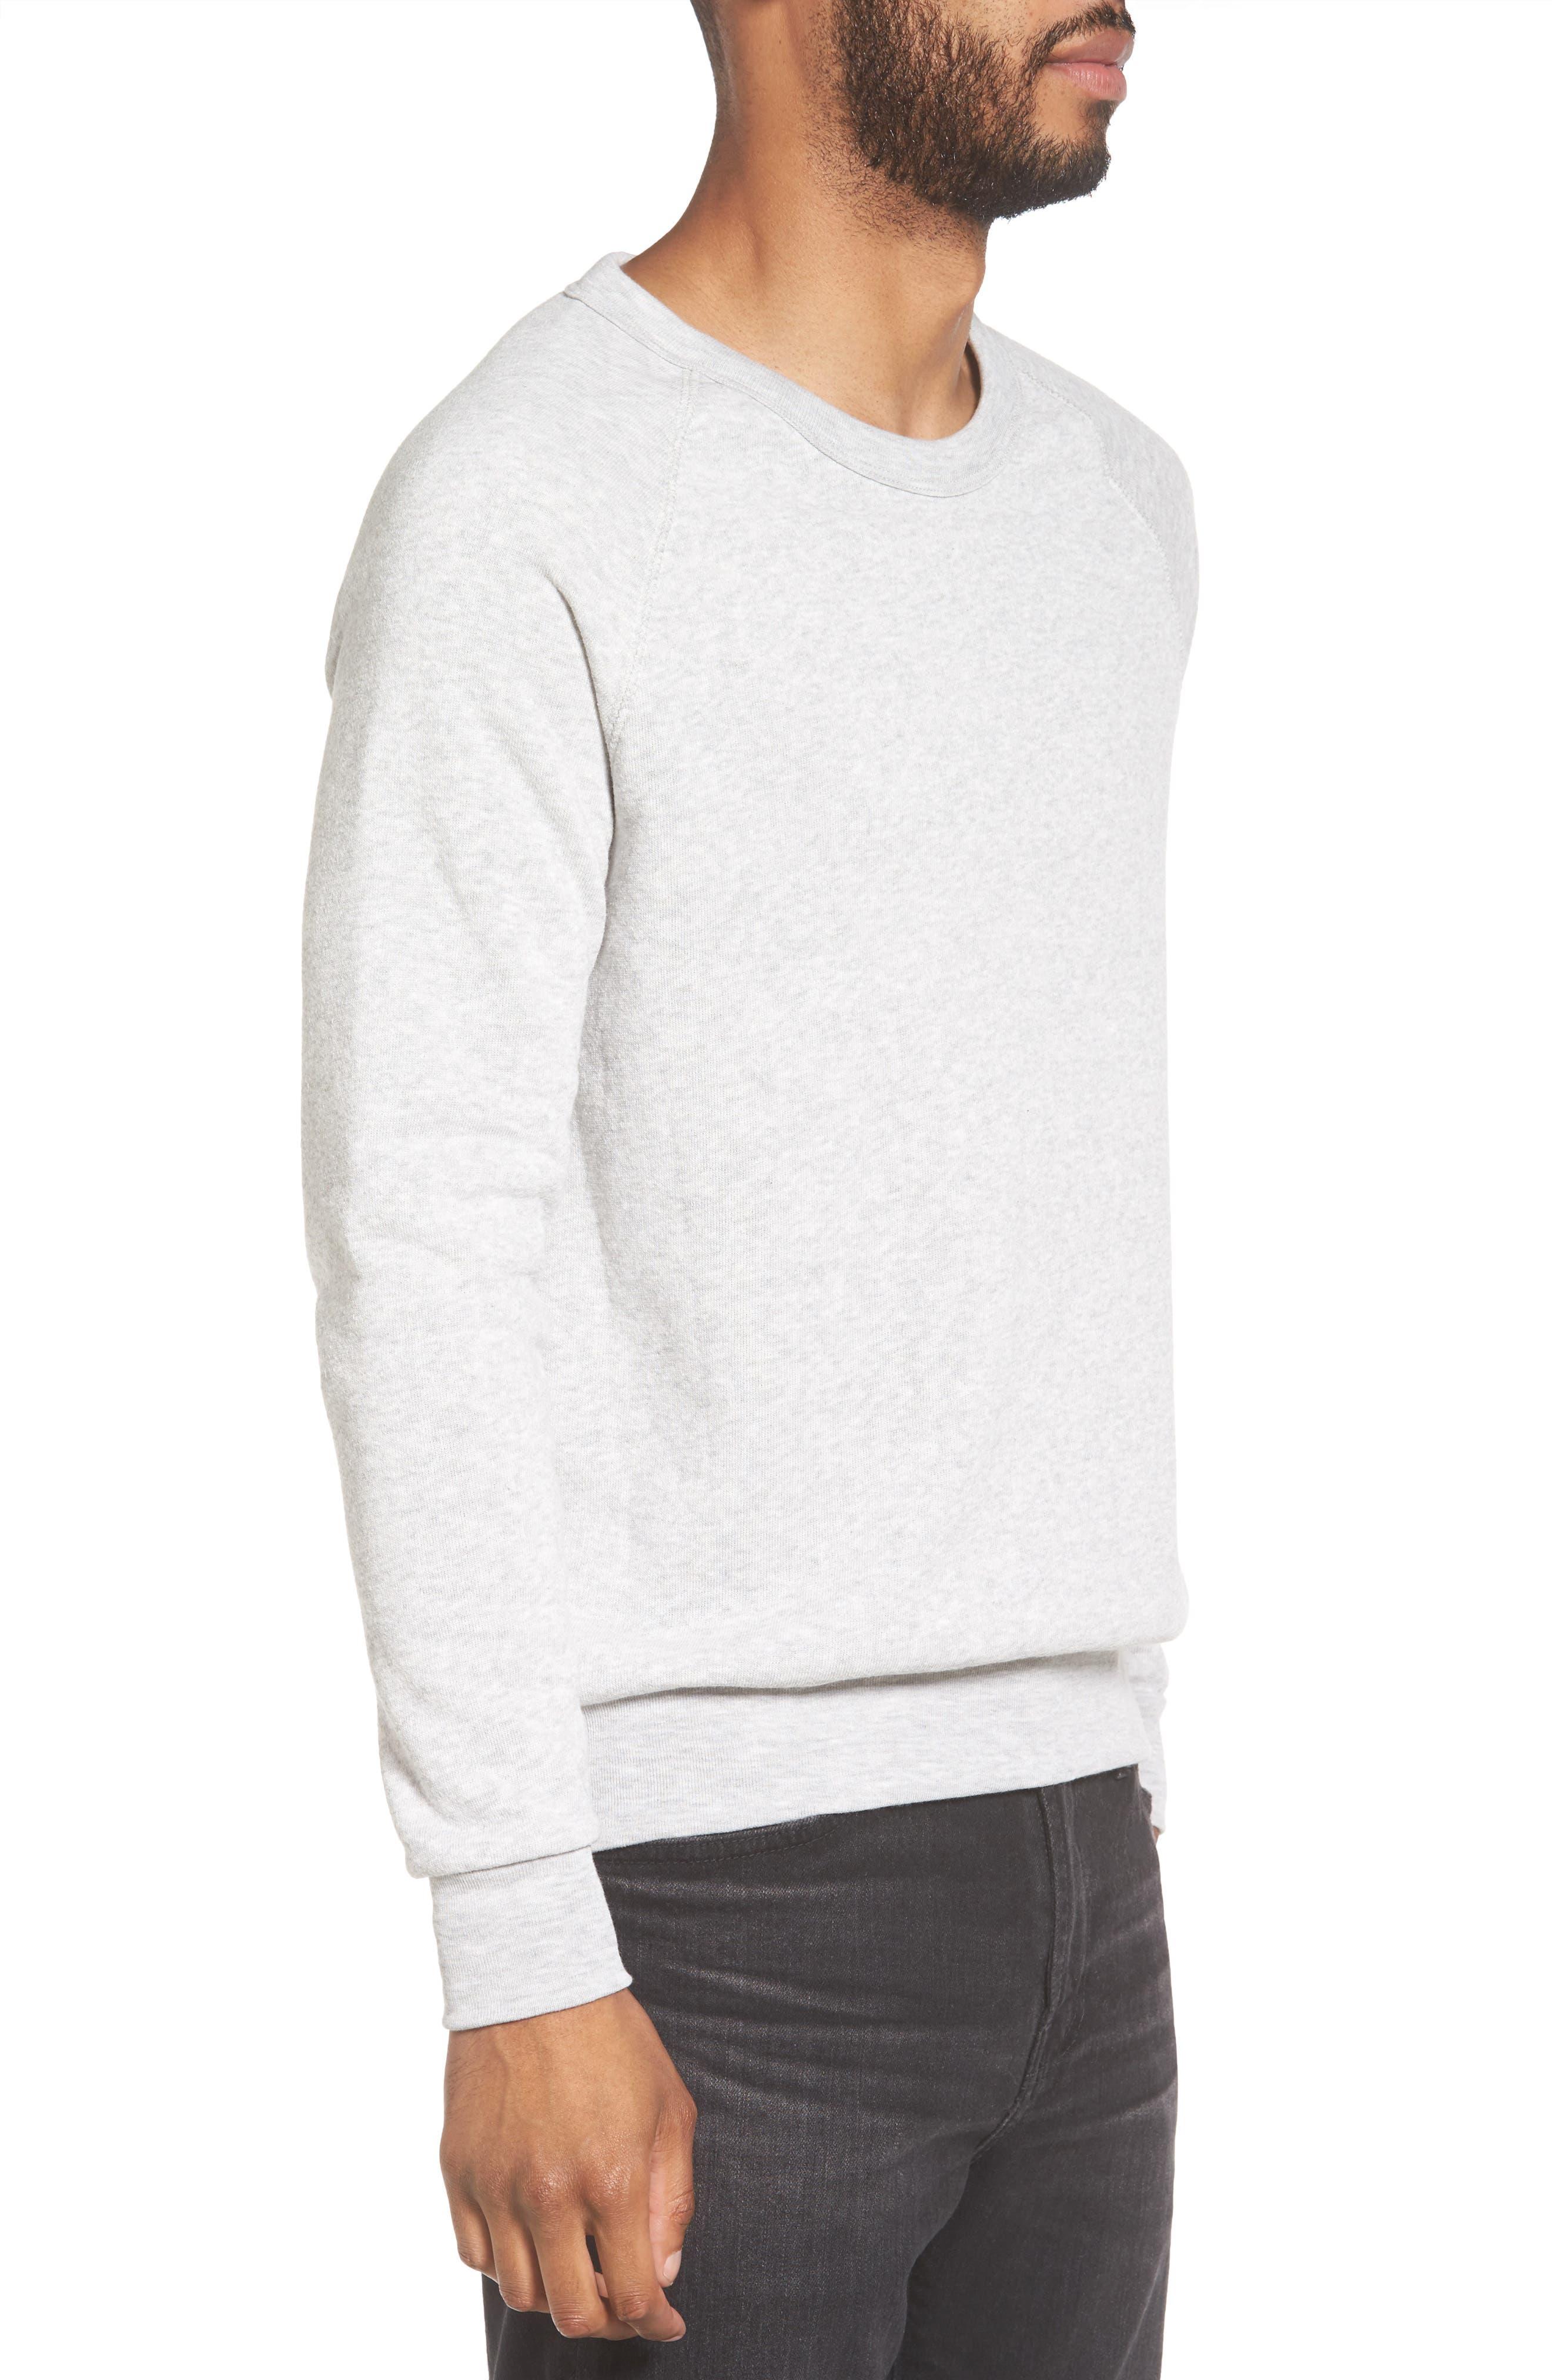 'The Champ' Sweatshirt,                             Alternate thumbnail 43, color,